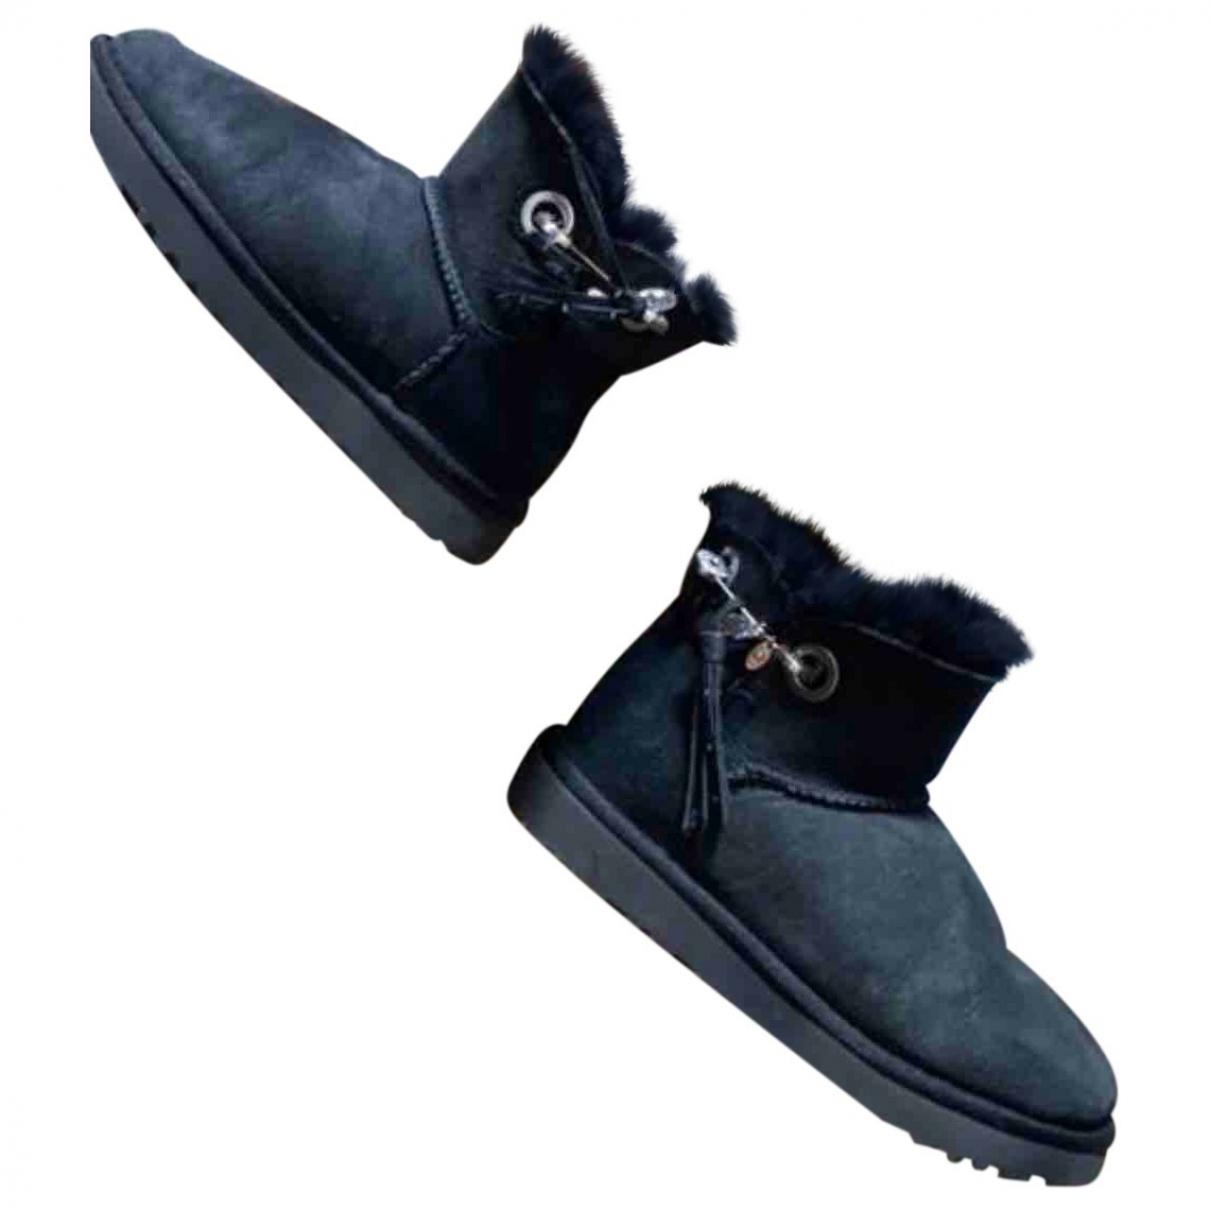 Ugg & Jimmy Choo \N Black Leather Boots for Women 37 EU